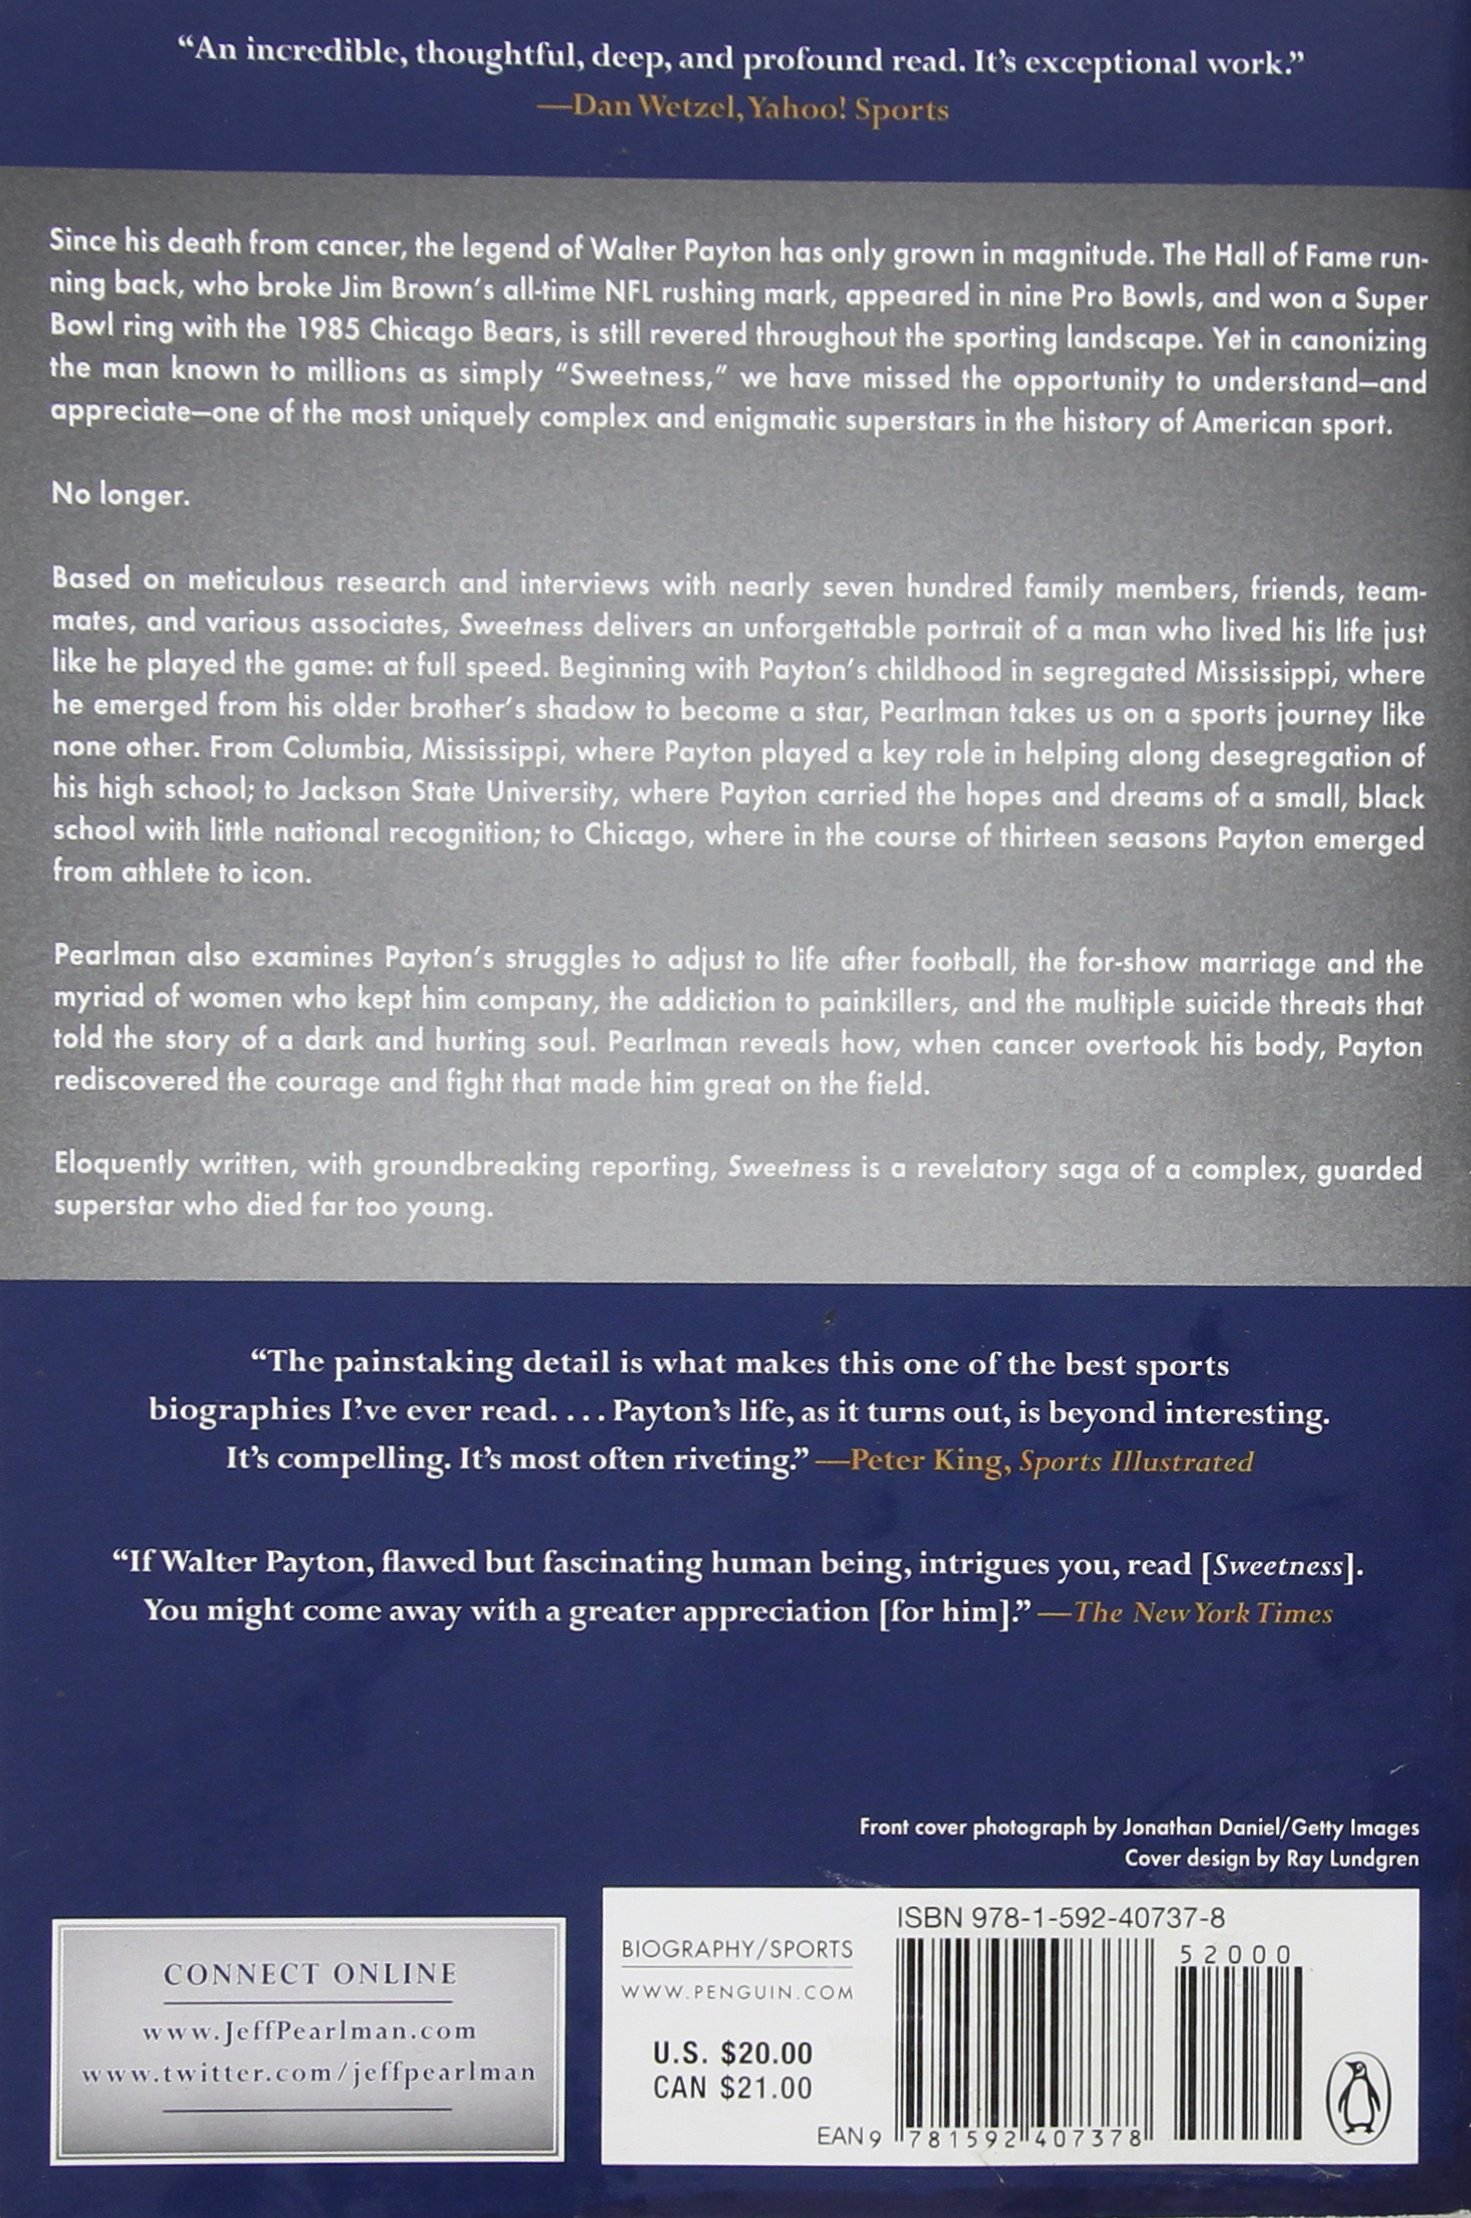 Amazon.com: Sweetness: The Enigmatic Life of Walter Payton (8601403678210):  Jeff Pearlman: Books